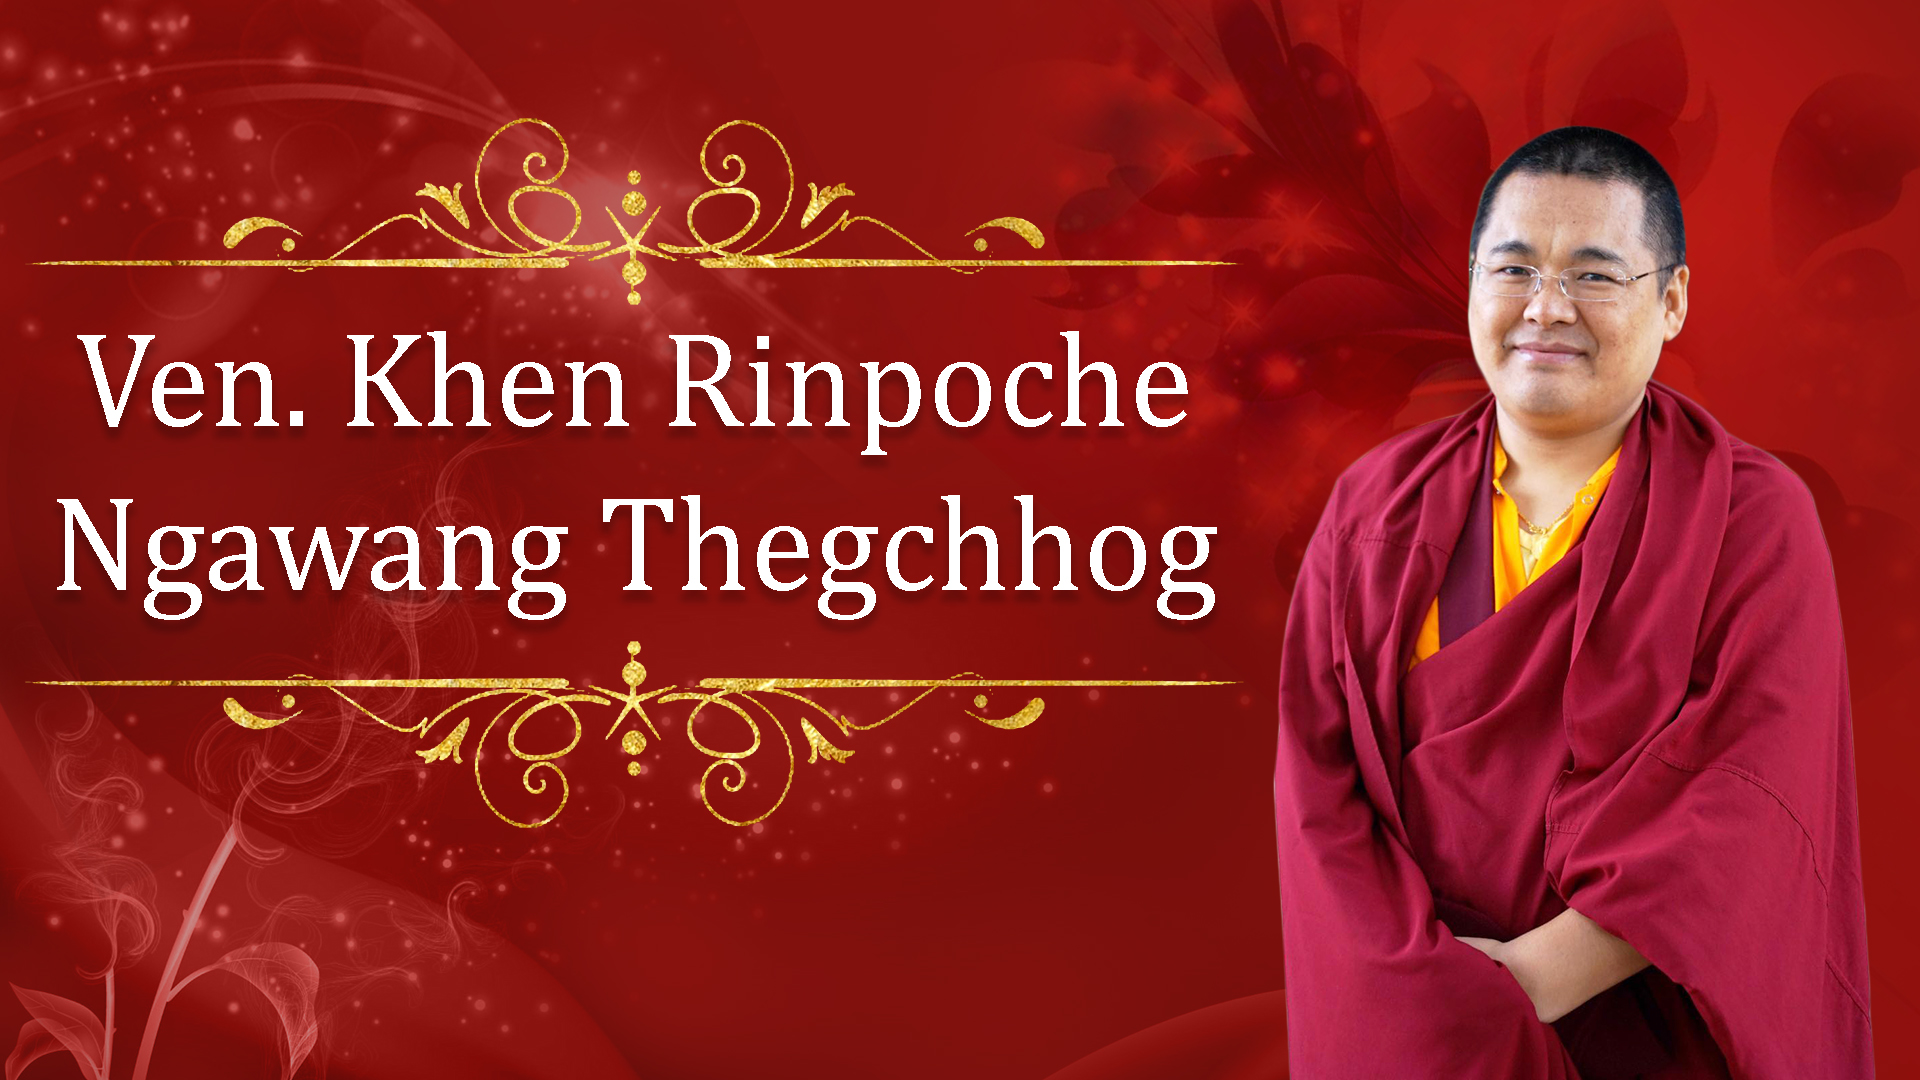 Ven. Khen Rinpoche